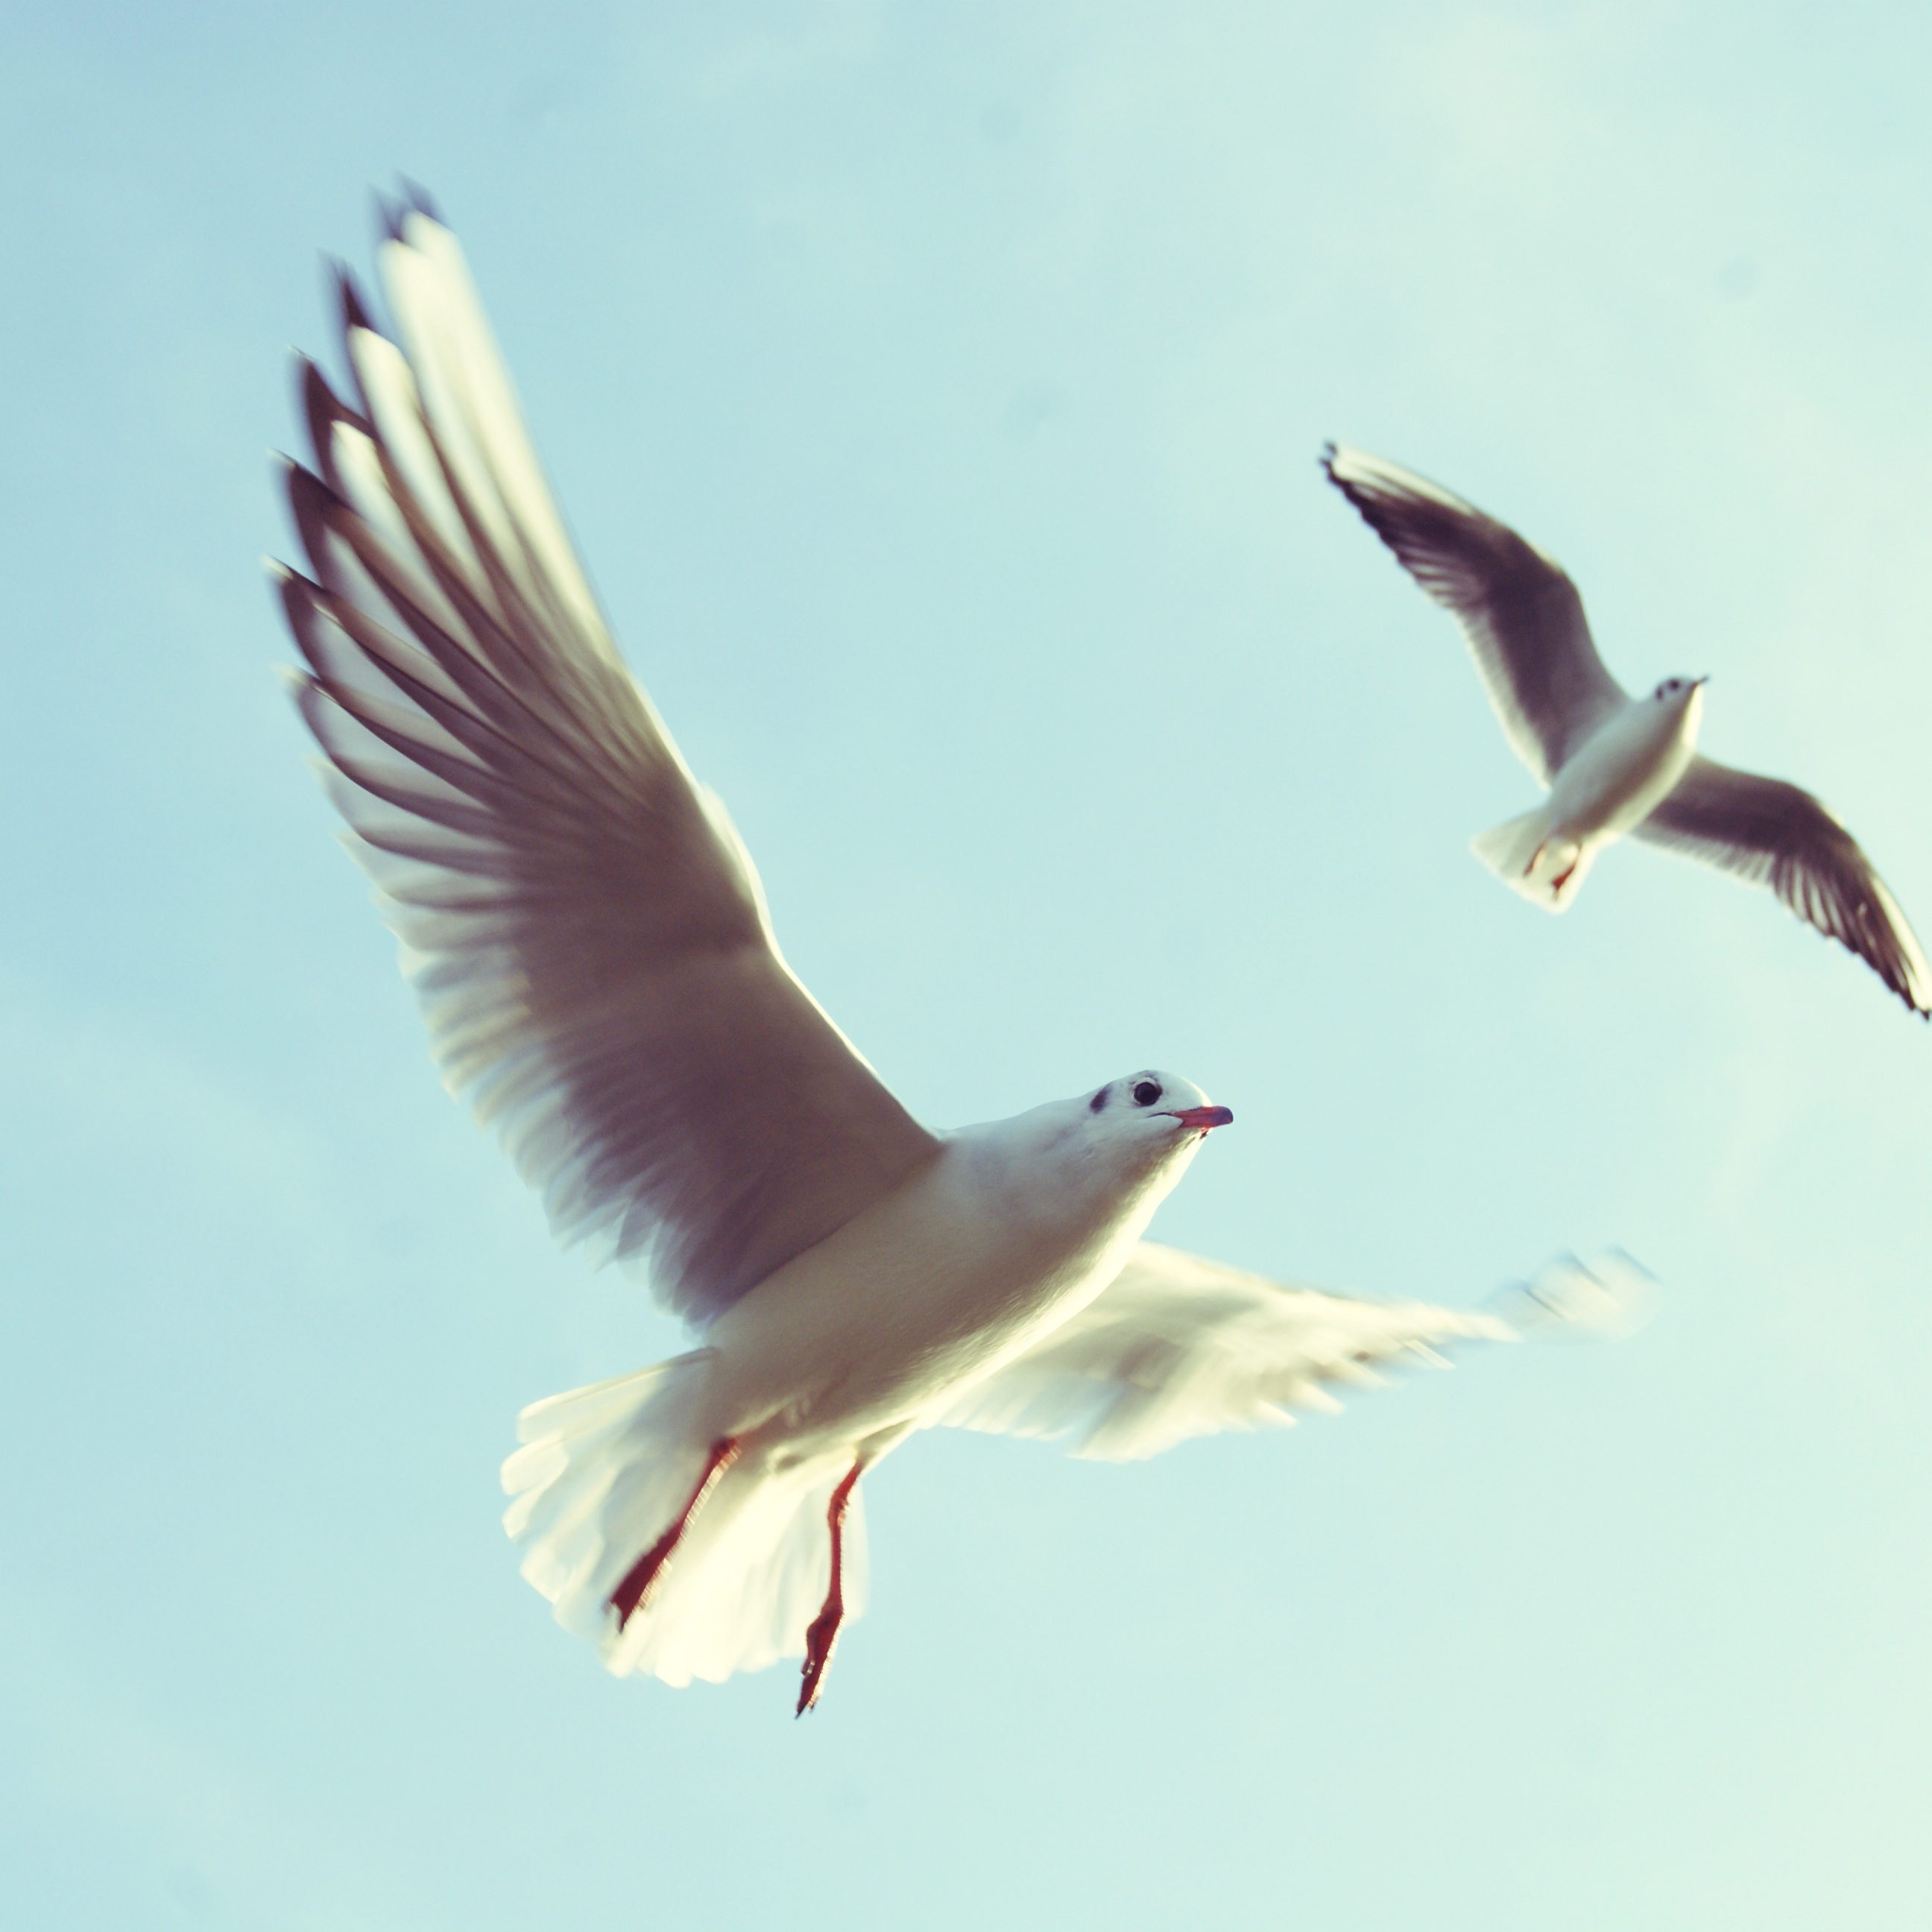 sky-flying-animals-birds